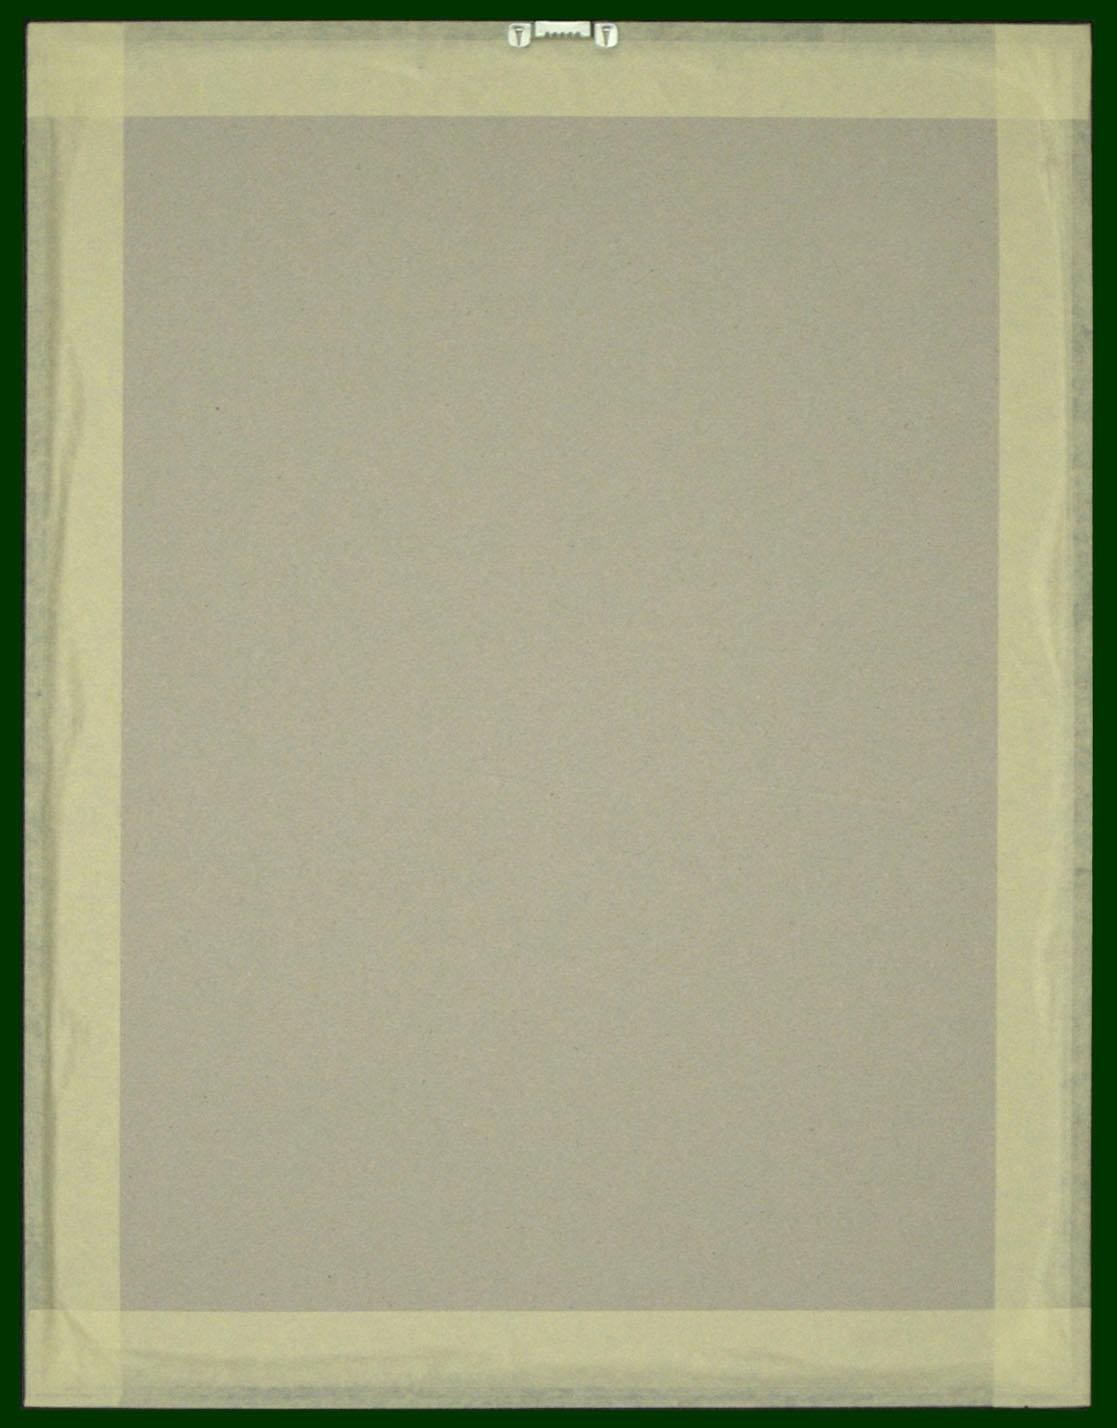 66-8hat.JPG (1117×1428)